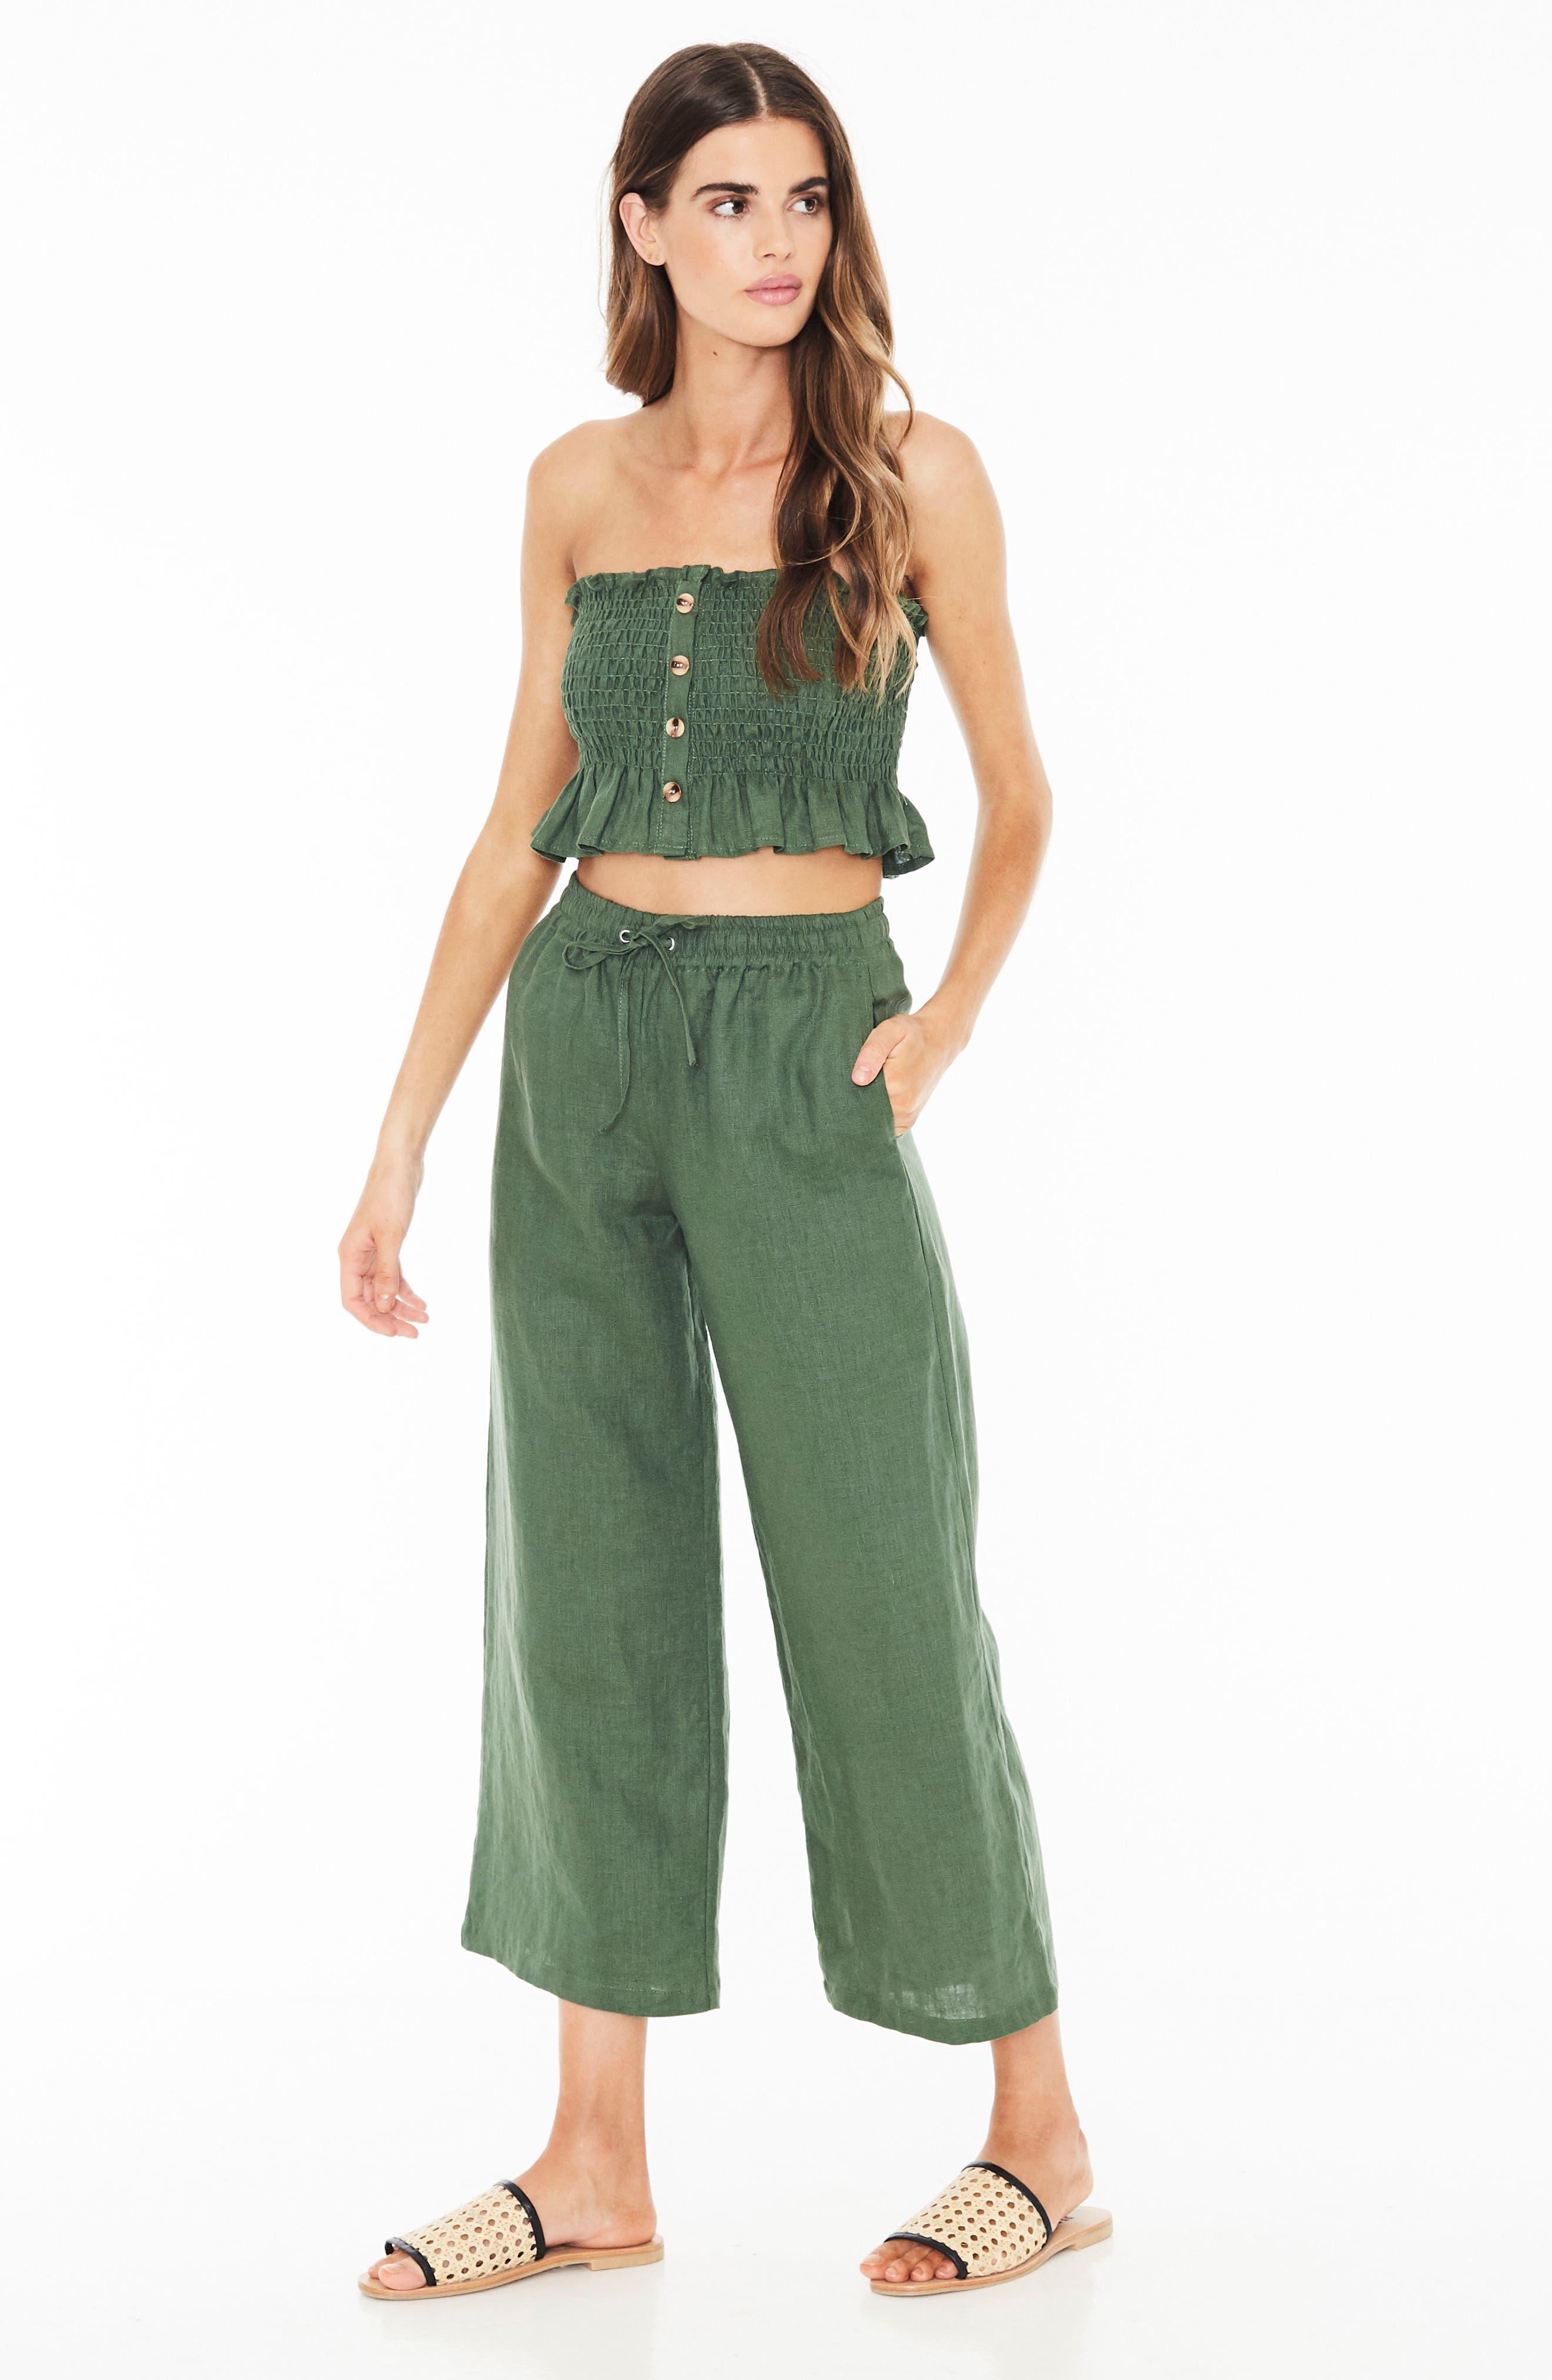 Clemence Linen Pants,                             Alternate thumbnail 4, color,                             PLAIN MOSS GREEN